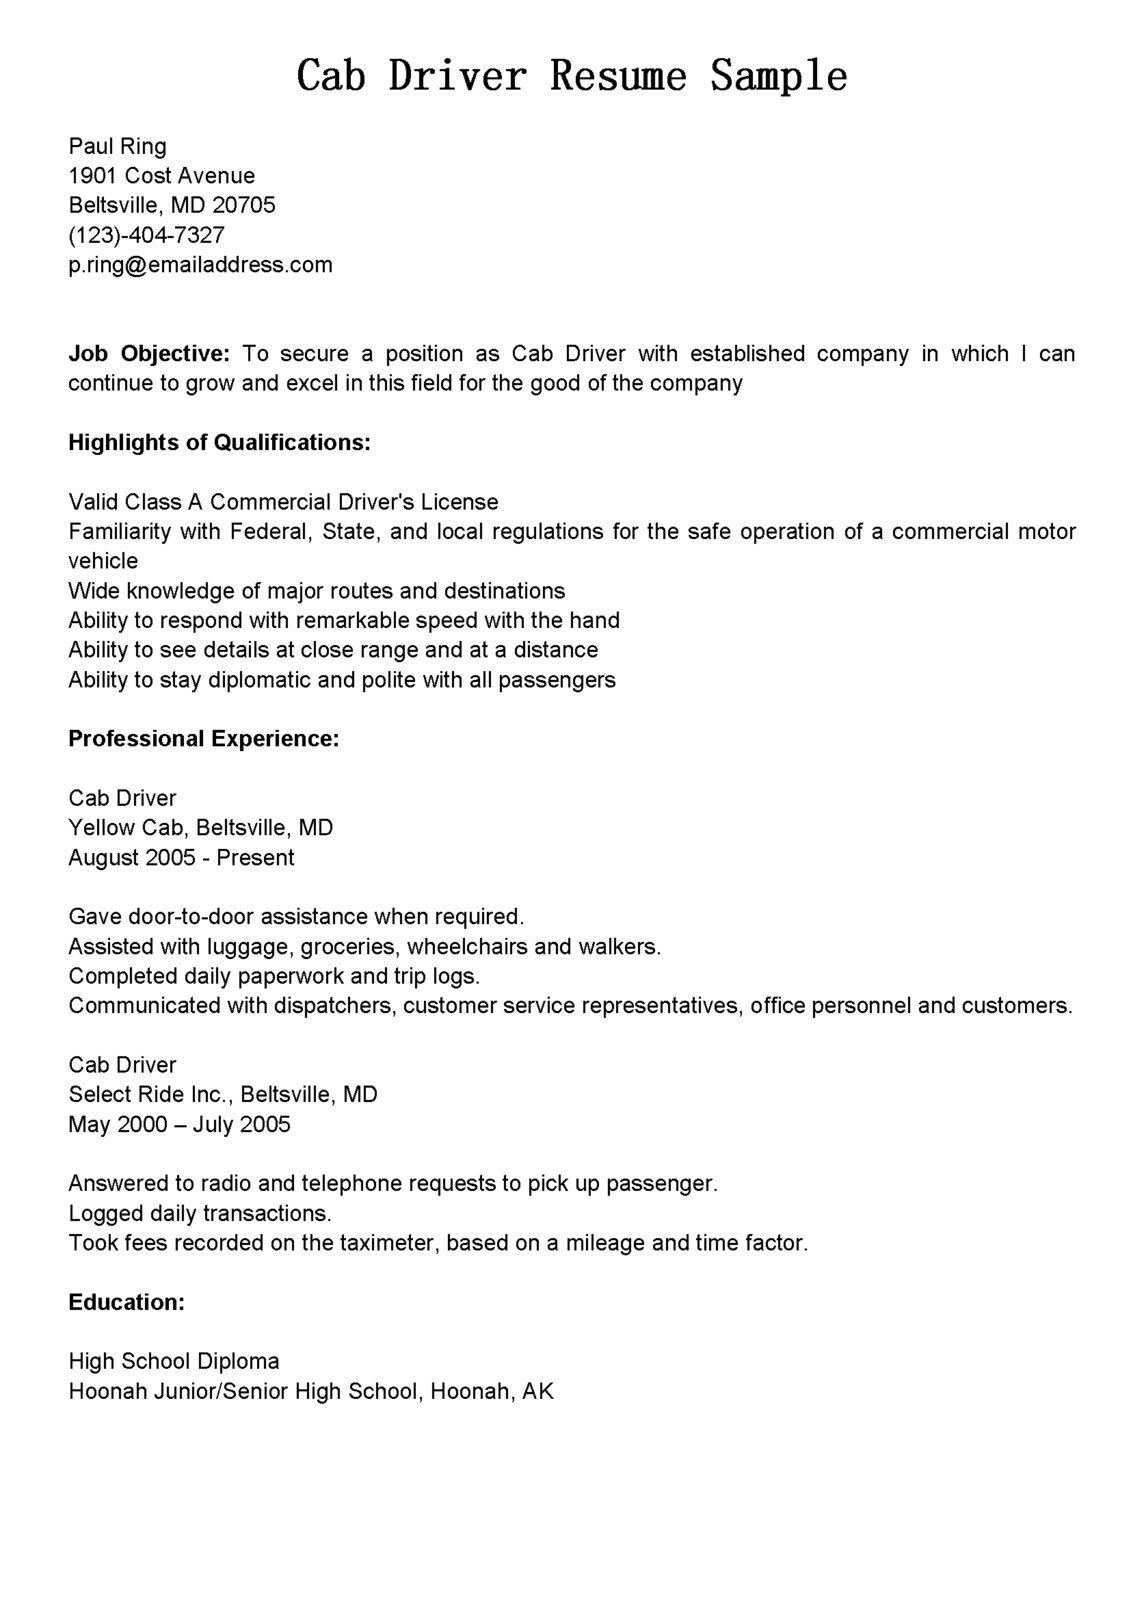 Cdl Truck Driver Job Description For Resume Lovely Tow Truck Driver Resume Cover Letter Samples Cover